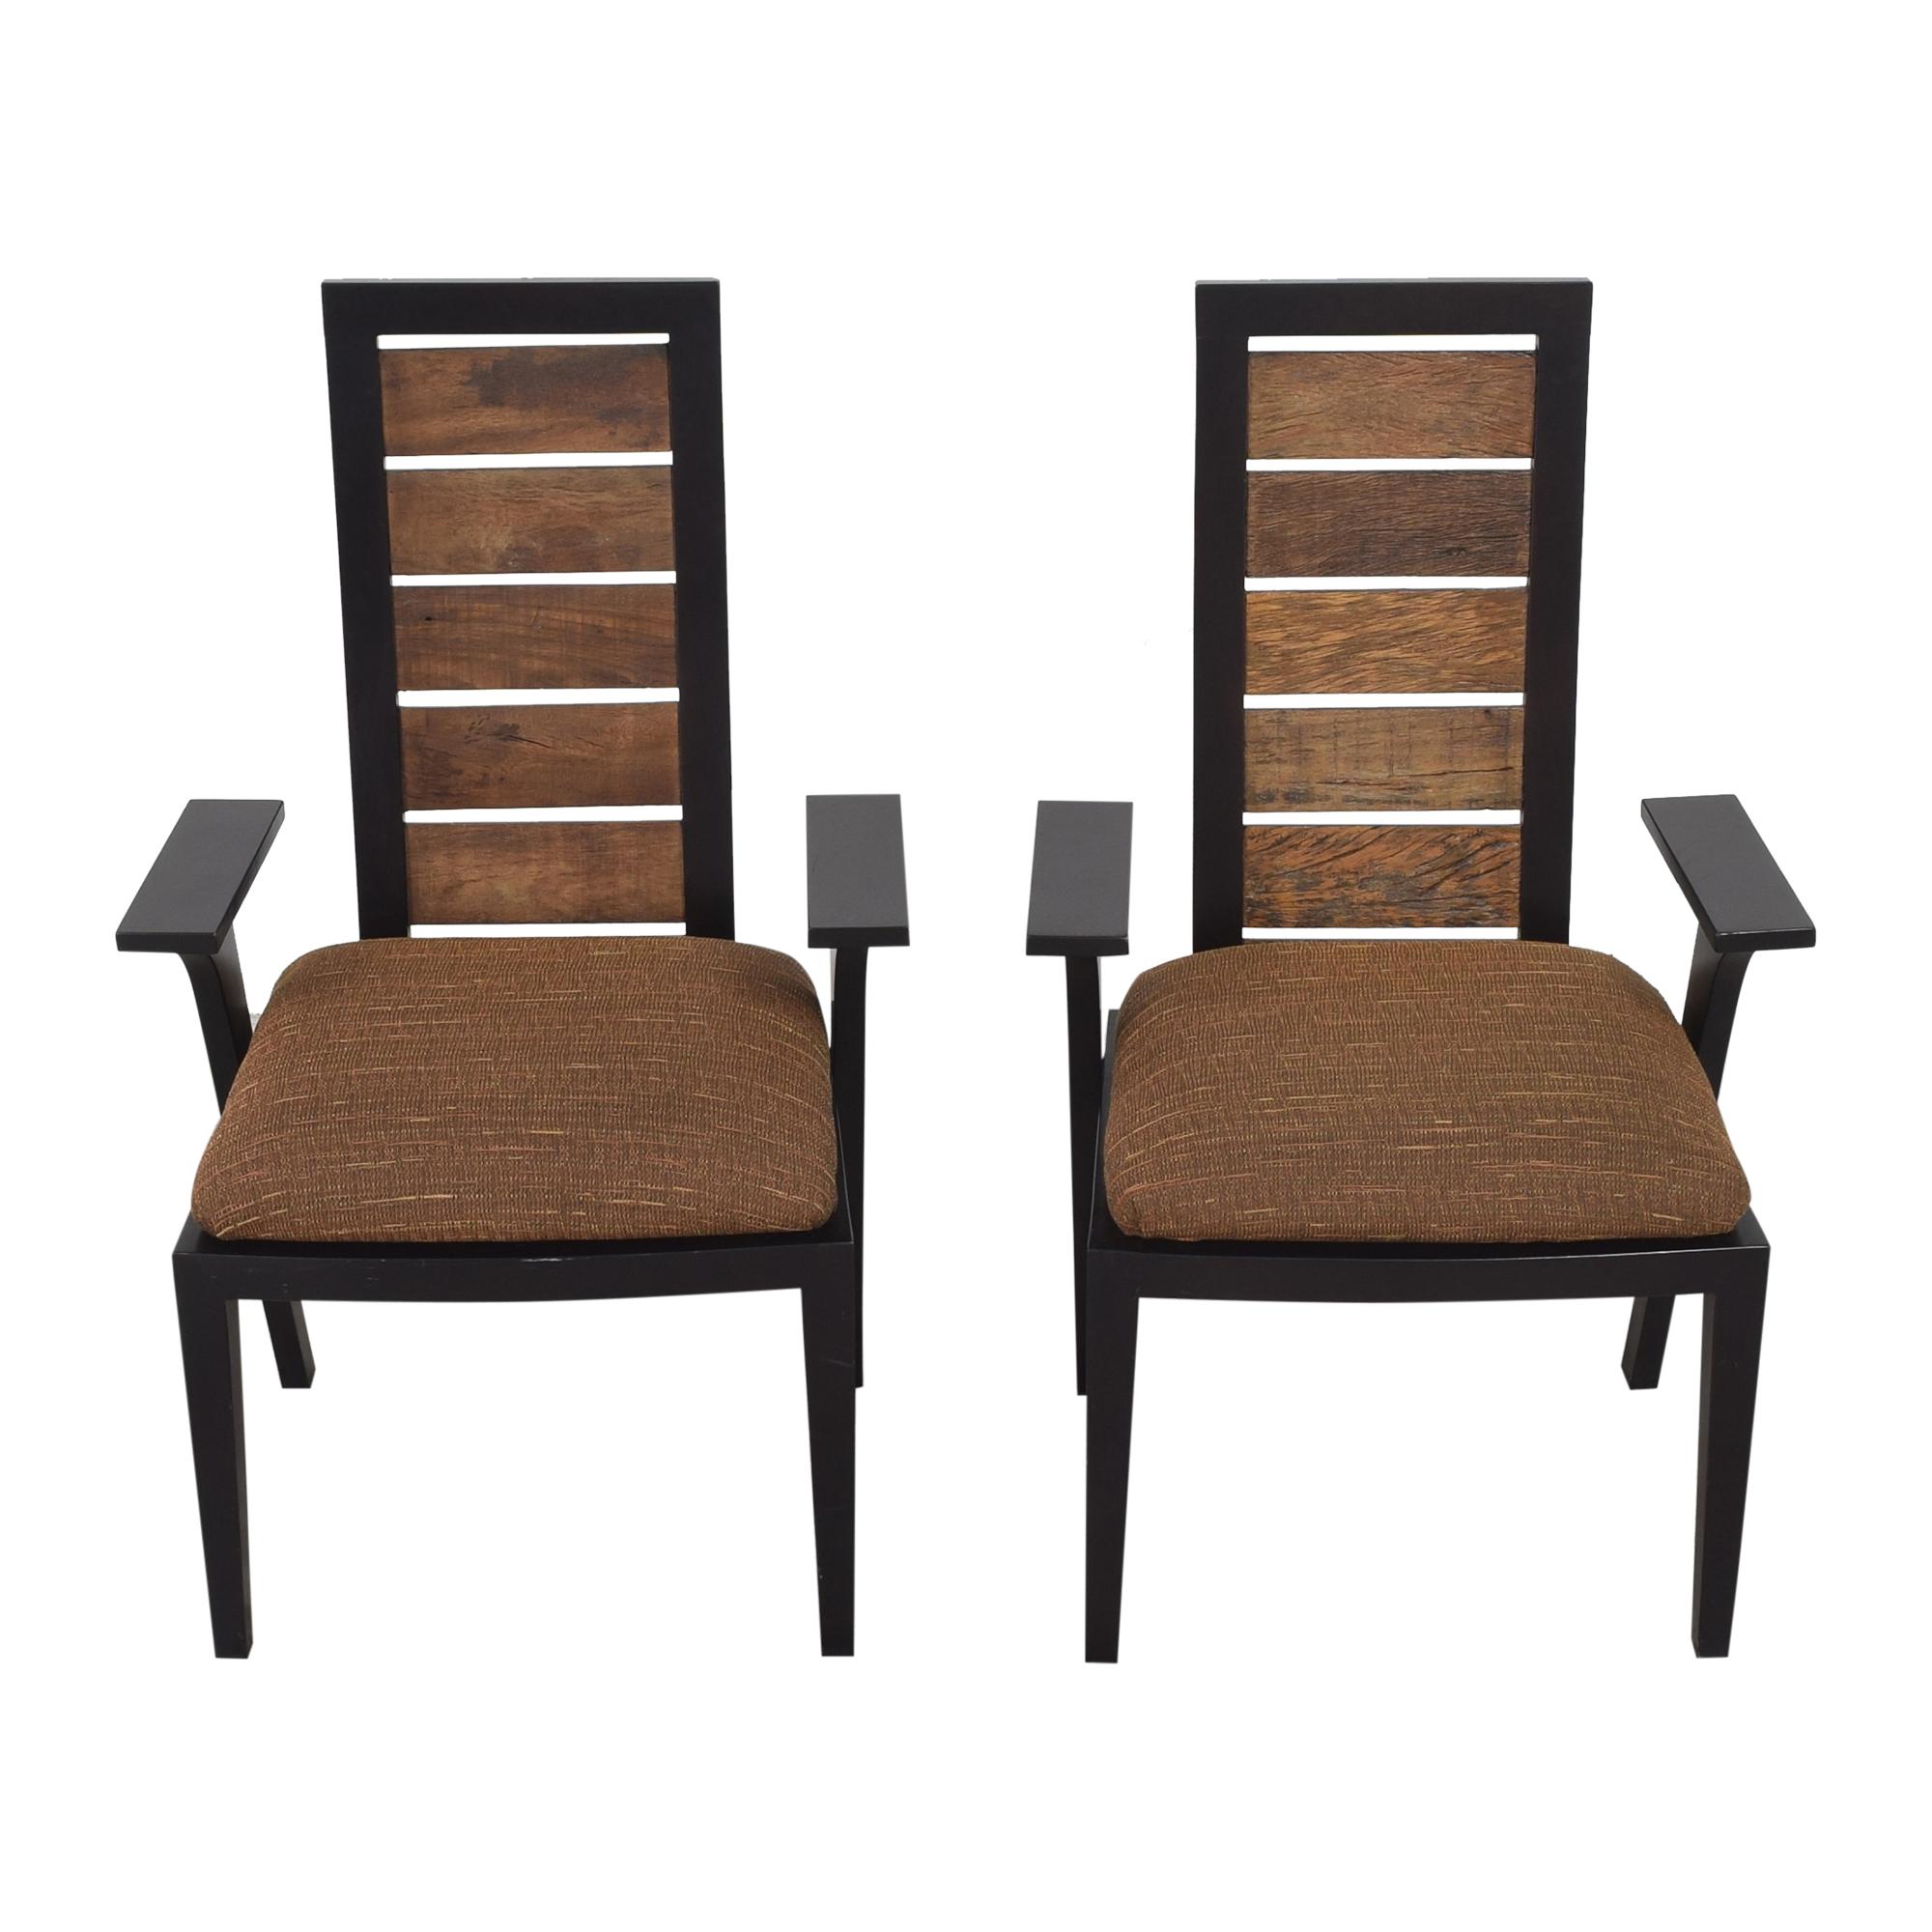 shop Environment Furniture Ipanema Chairs Environment Furniture Chairs